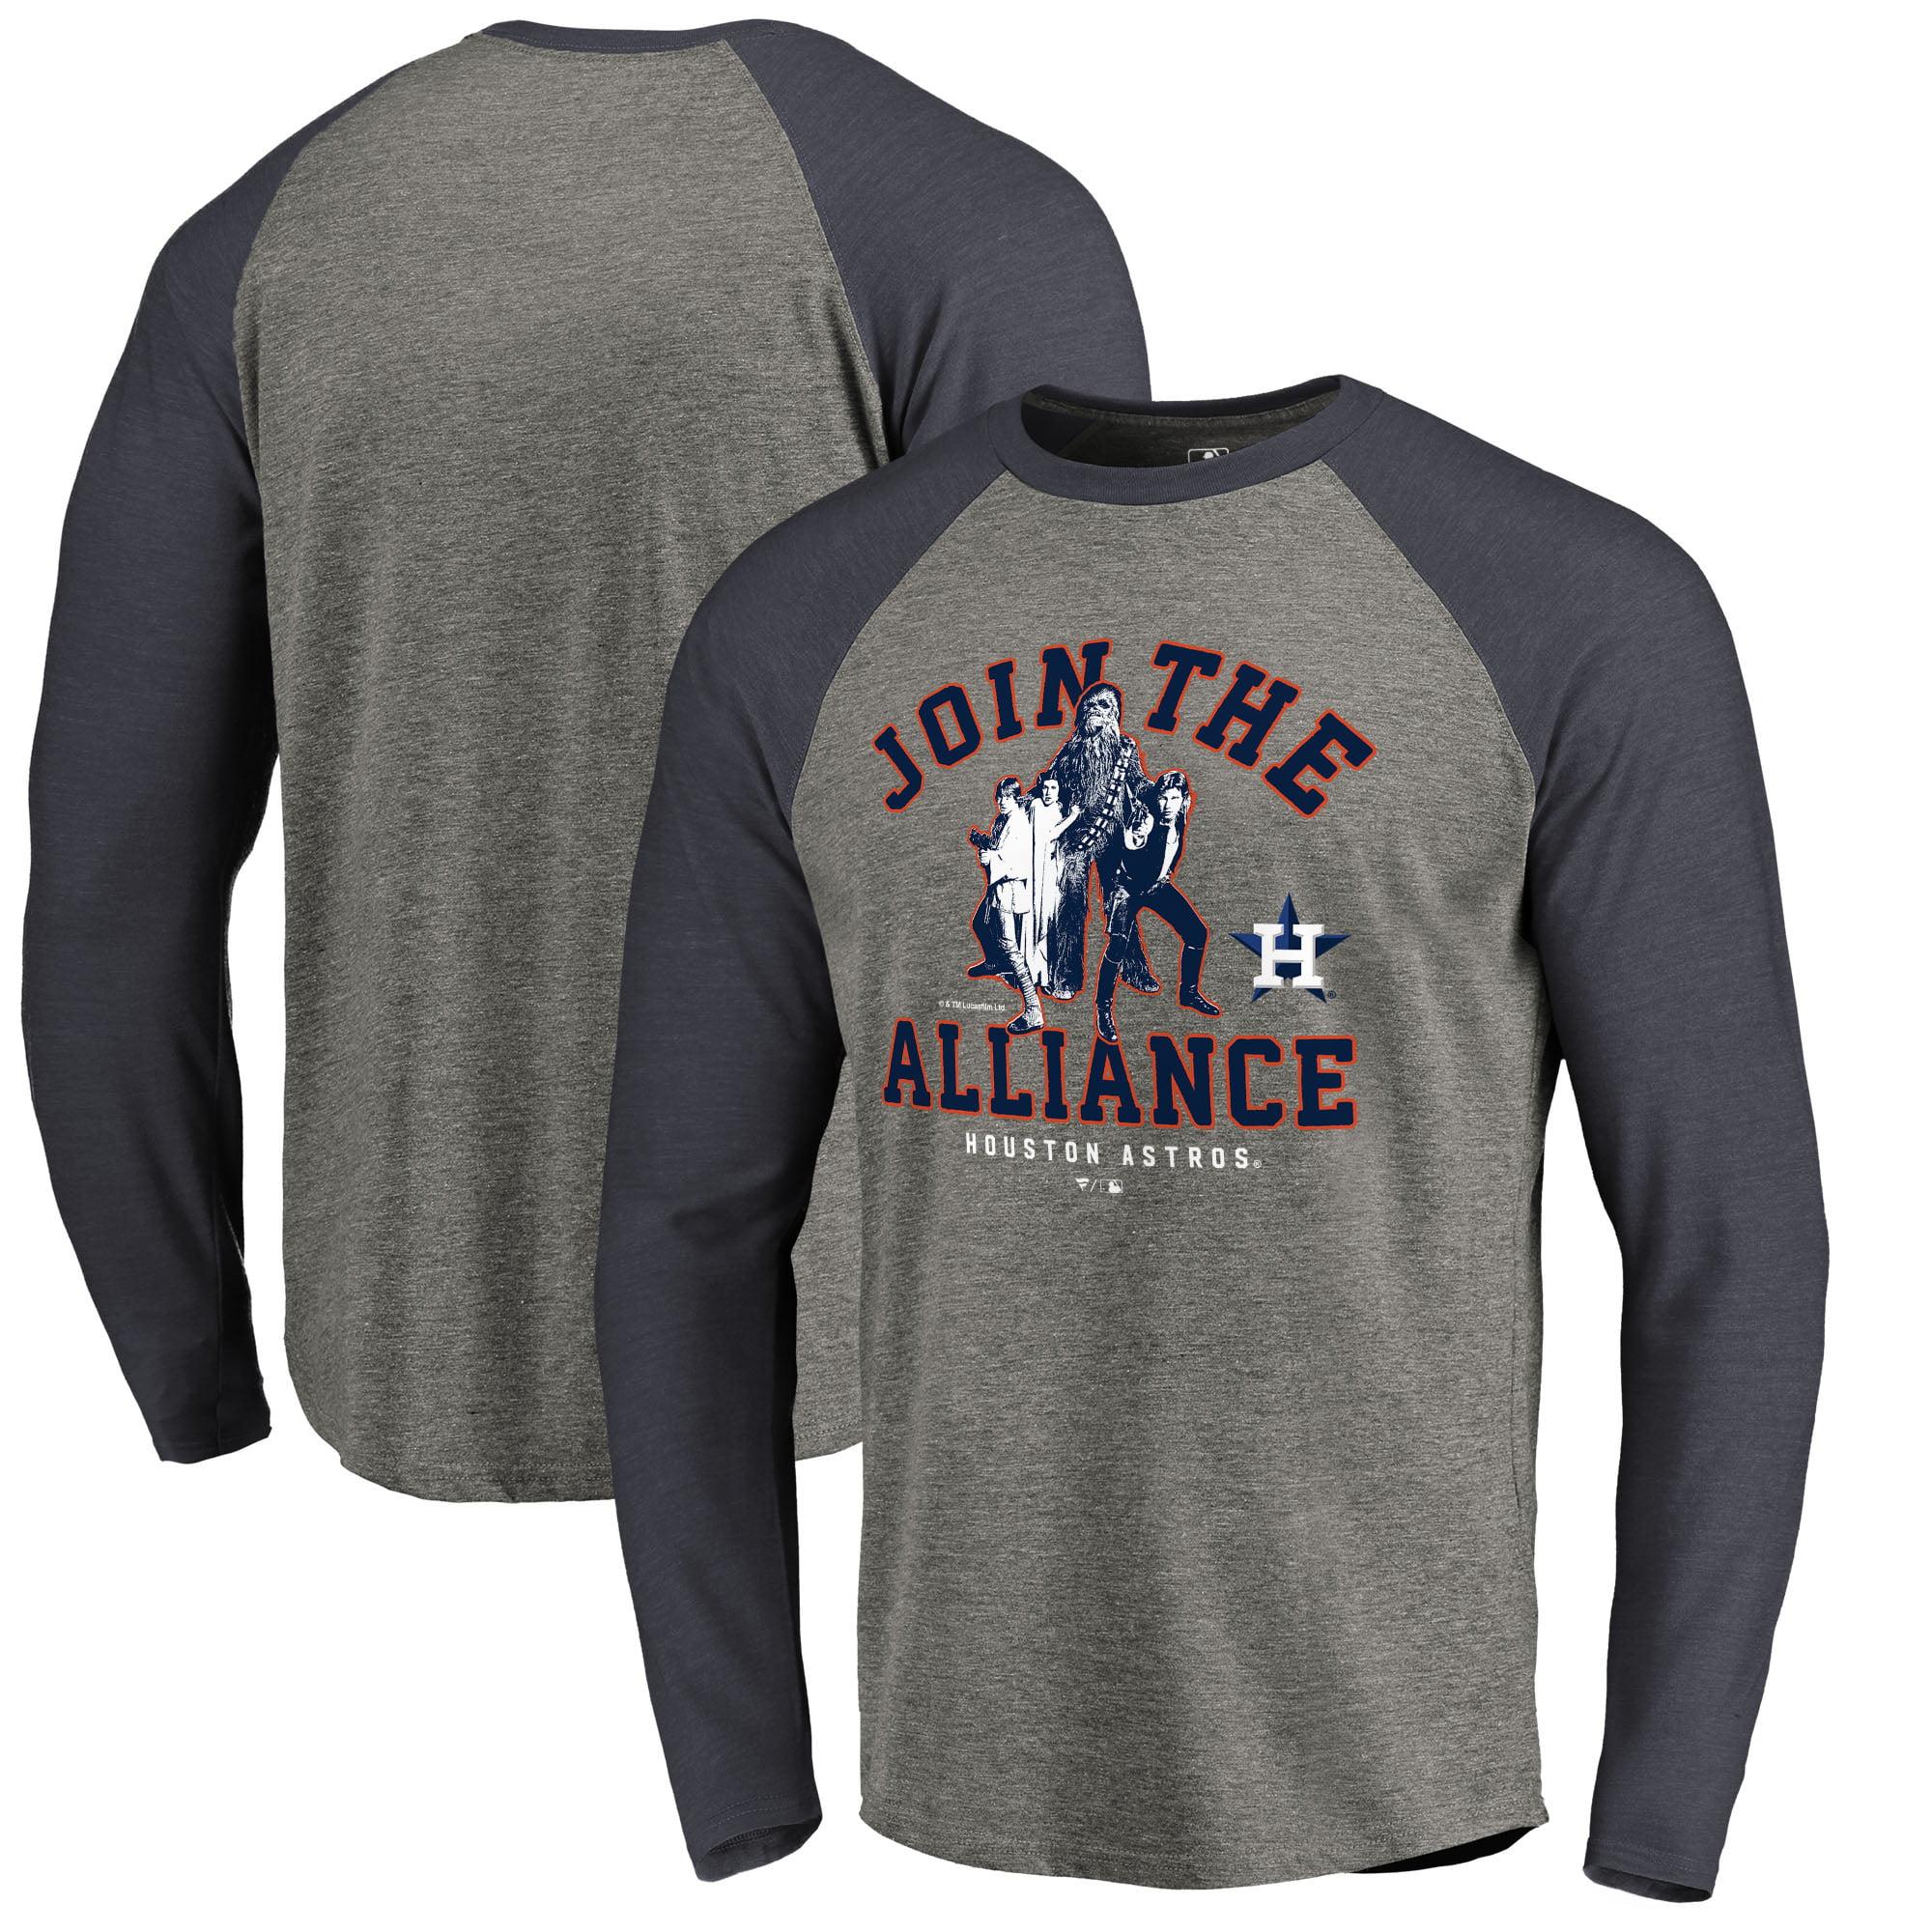 Houston Astros Fanatics Branded MLB Star Wars Join The Alliance Raglan Long Sleeve T-Shirt - Heather Gray